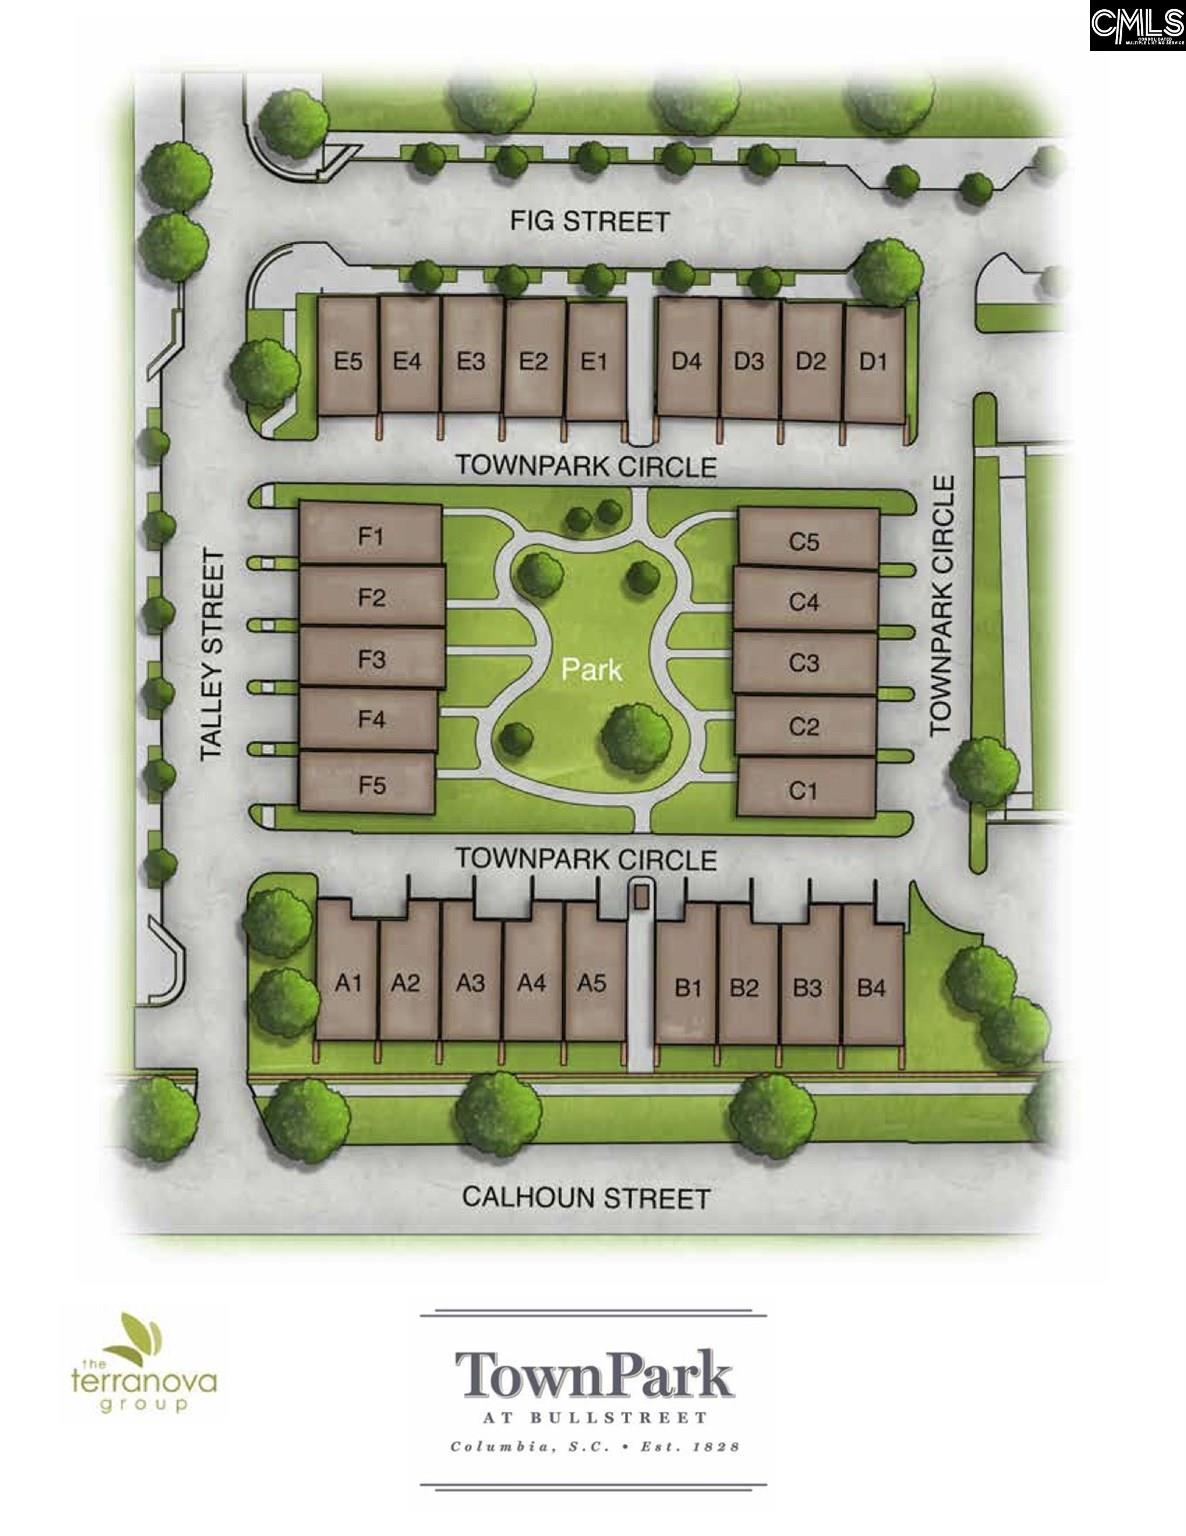 25 Townpark Columbia, SC 29201